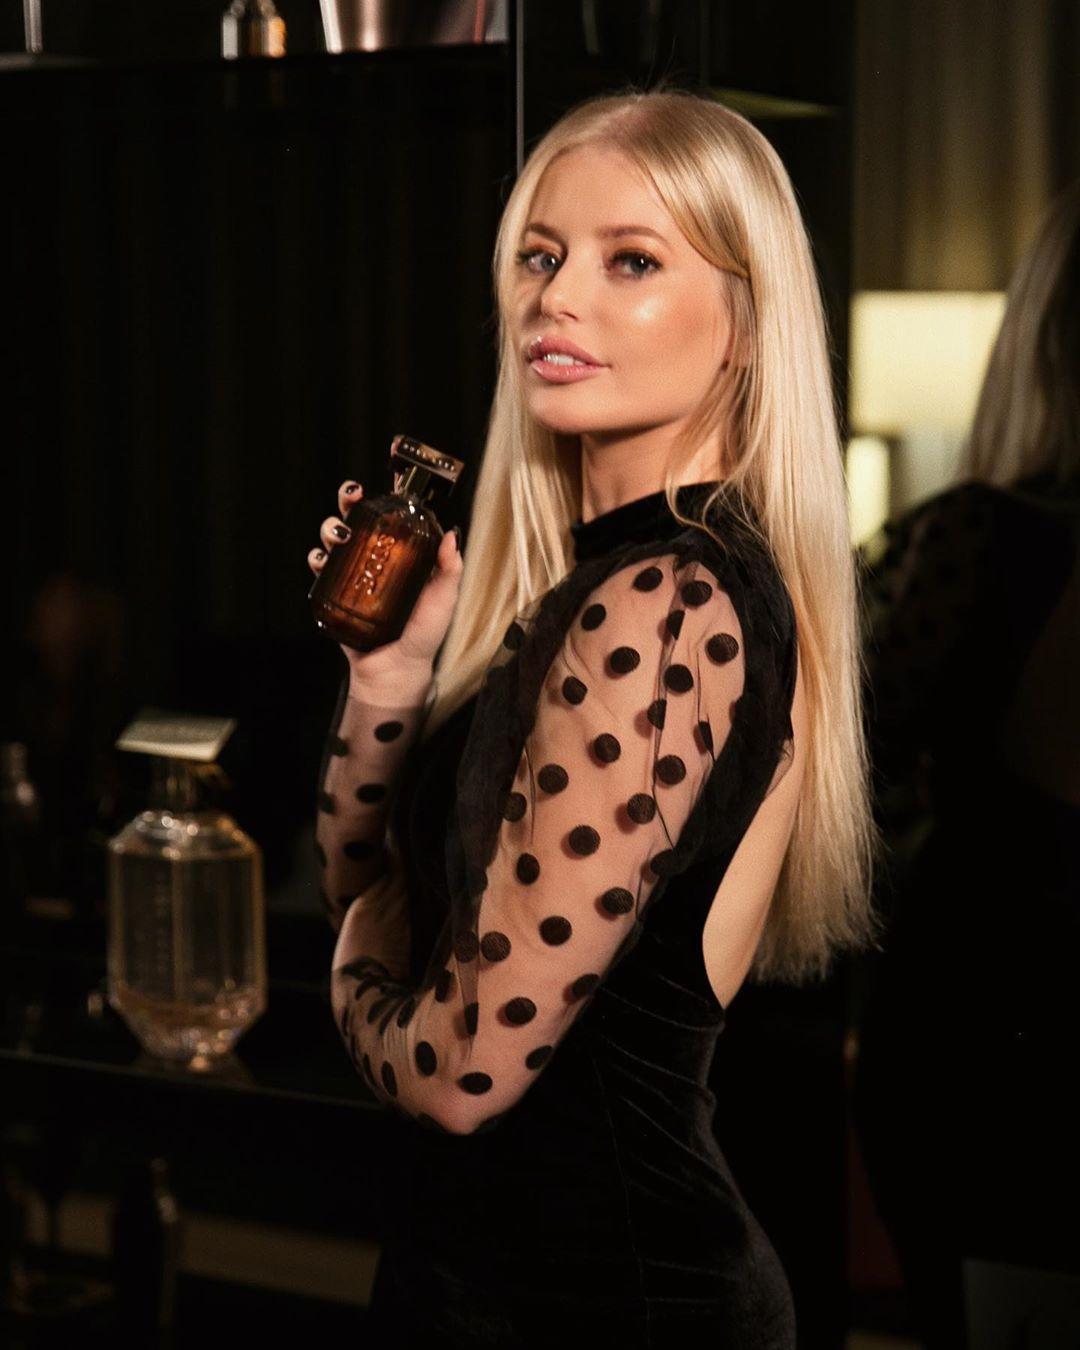 robe en velours et plumetis de Zara sur annabelpesant